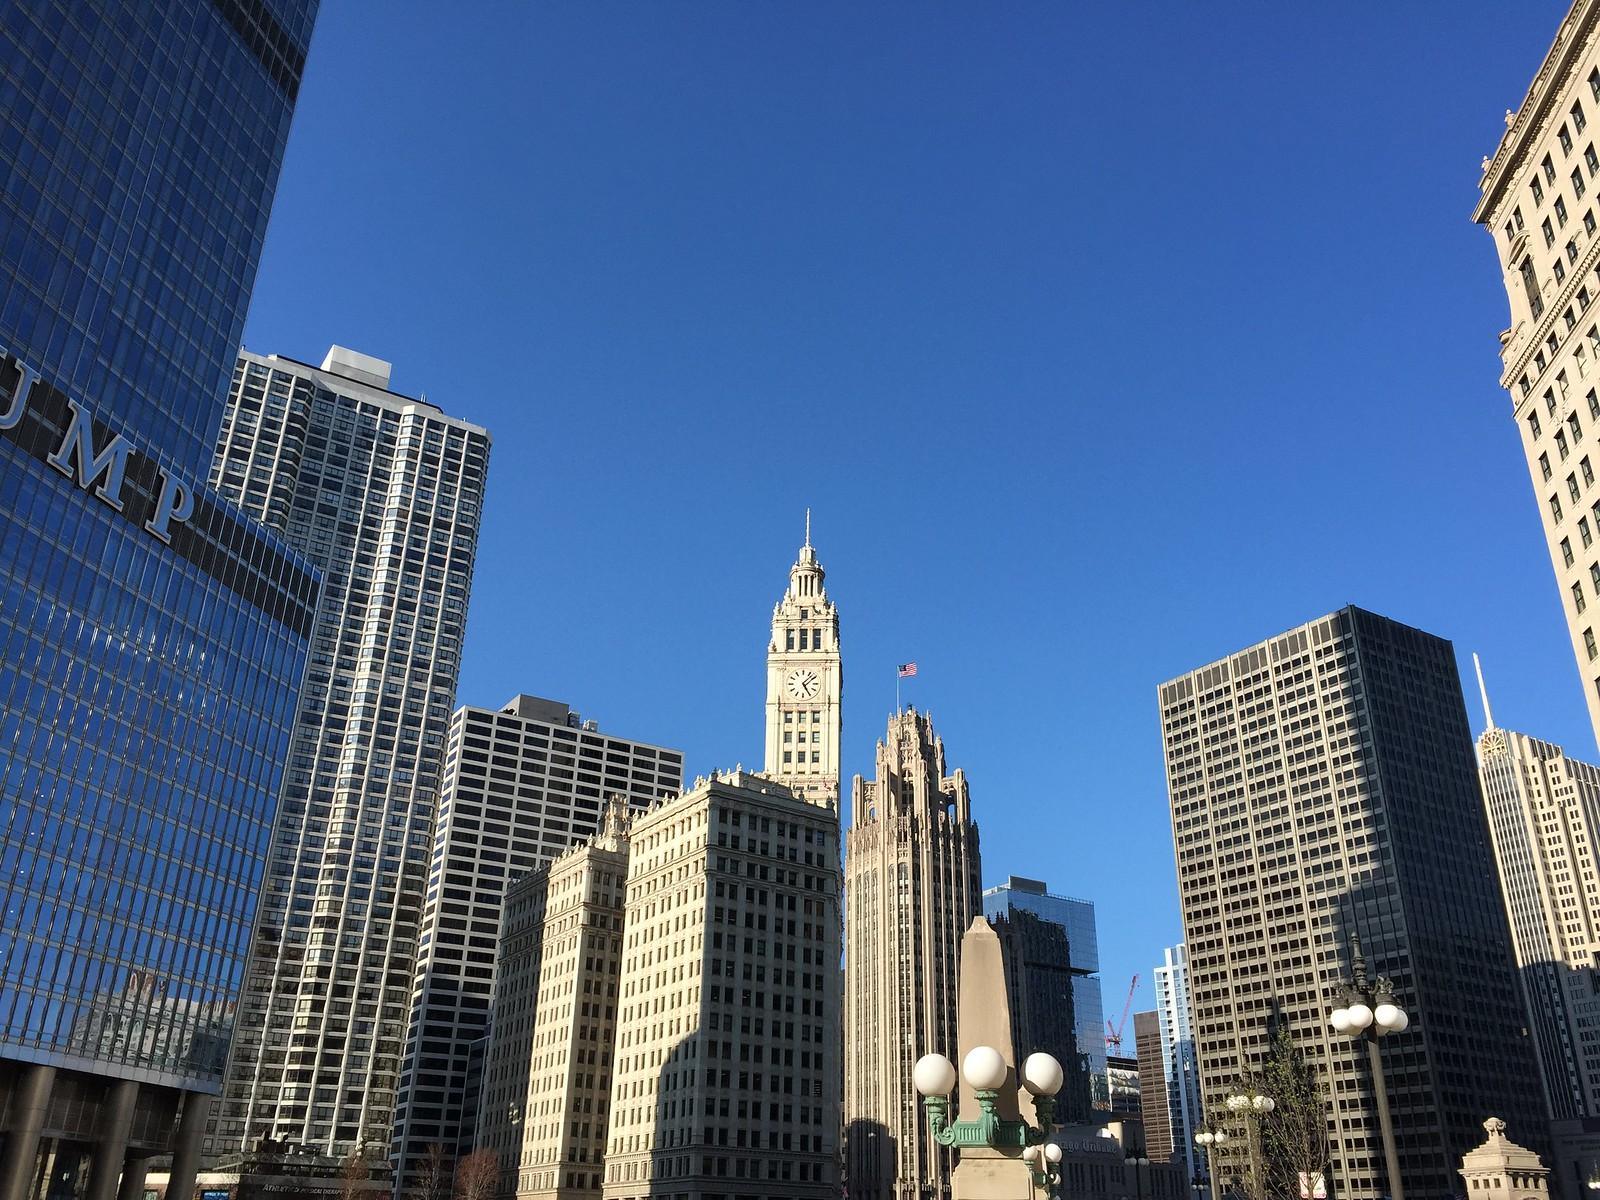 Chicago 21-04-2015 17-10-14